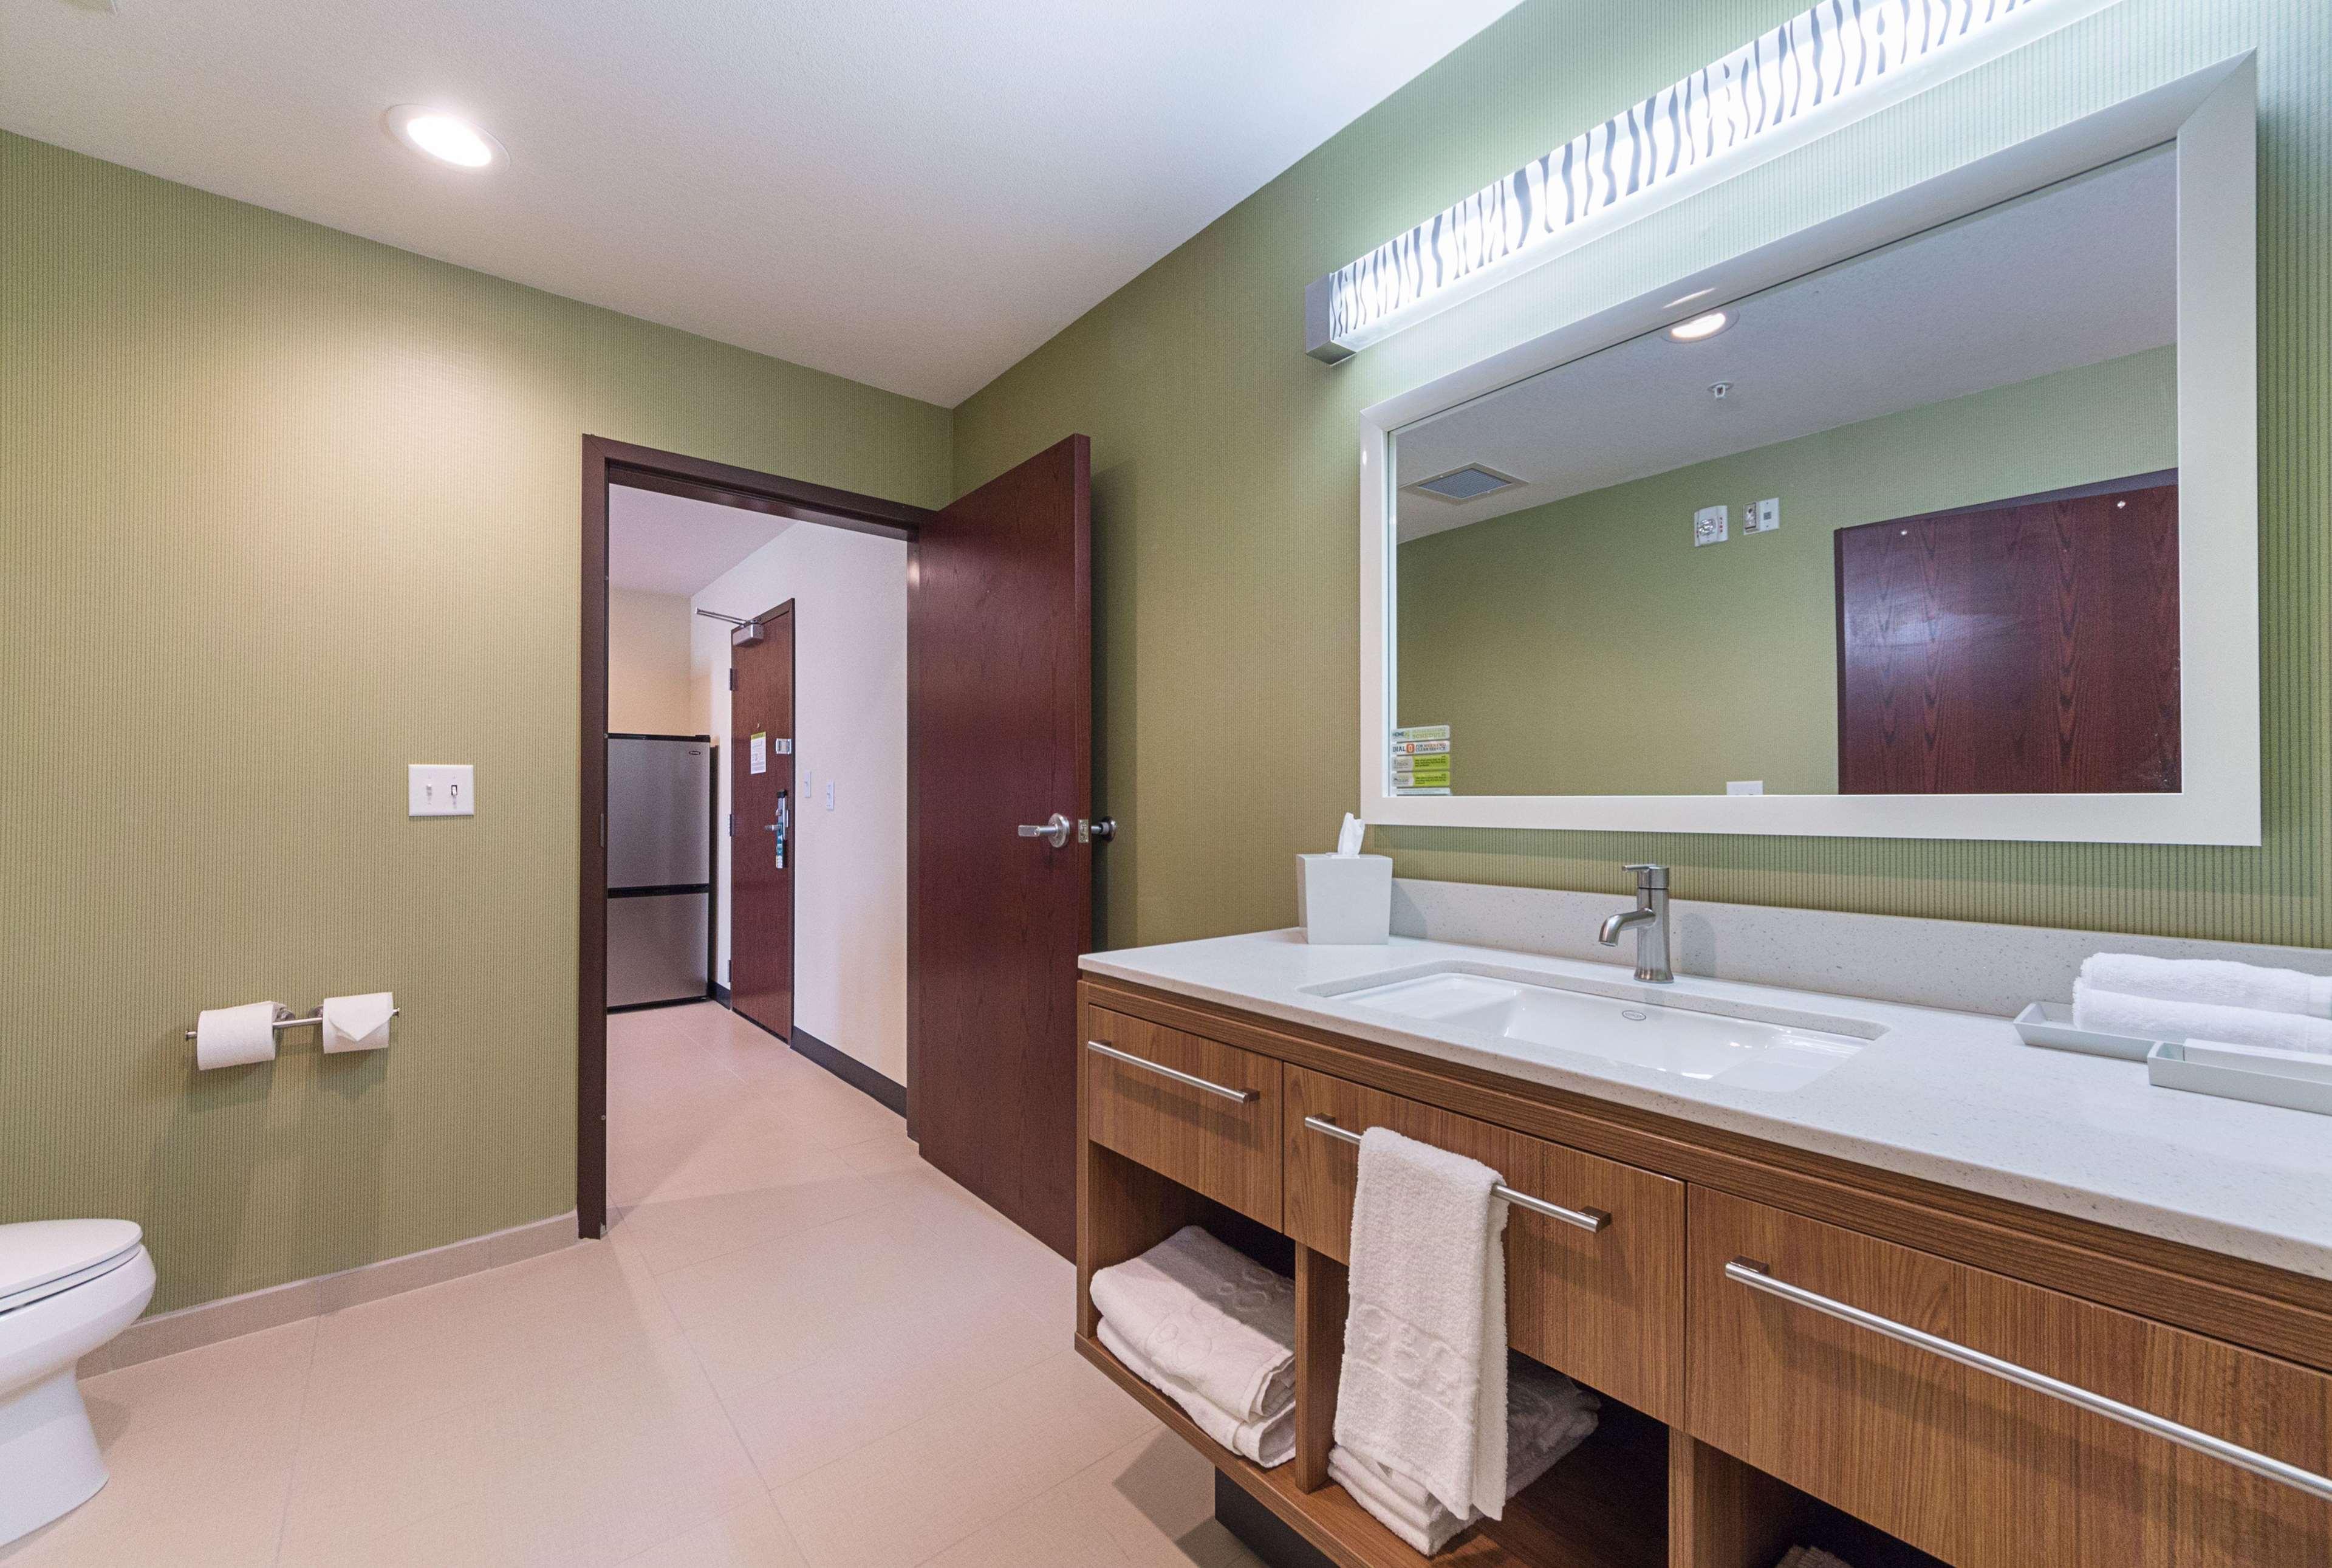 Home 2 Suites by Hilton - Yukon image 41